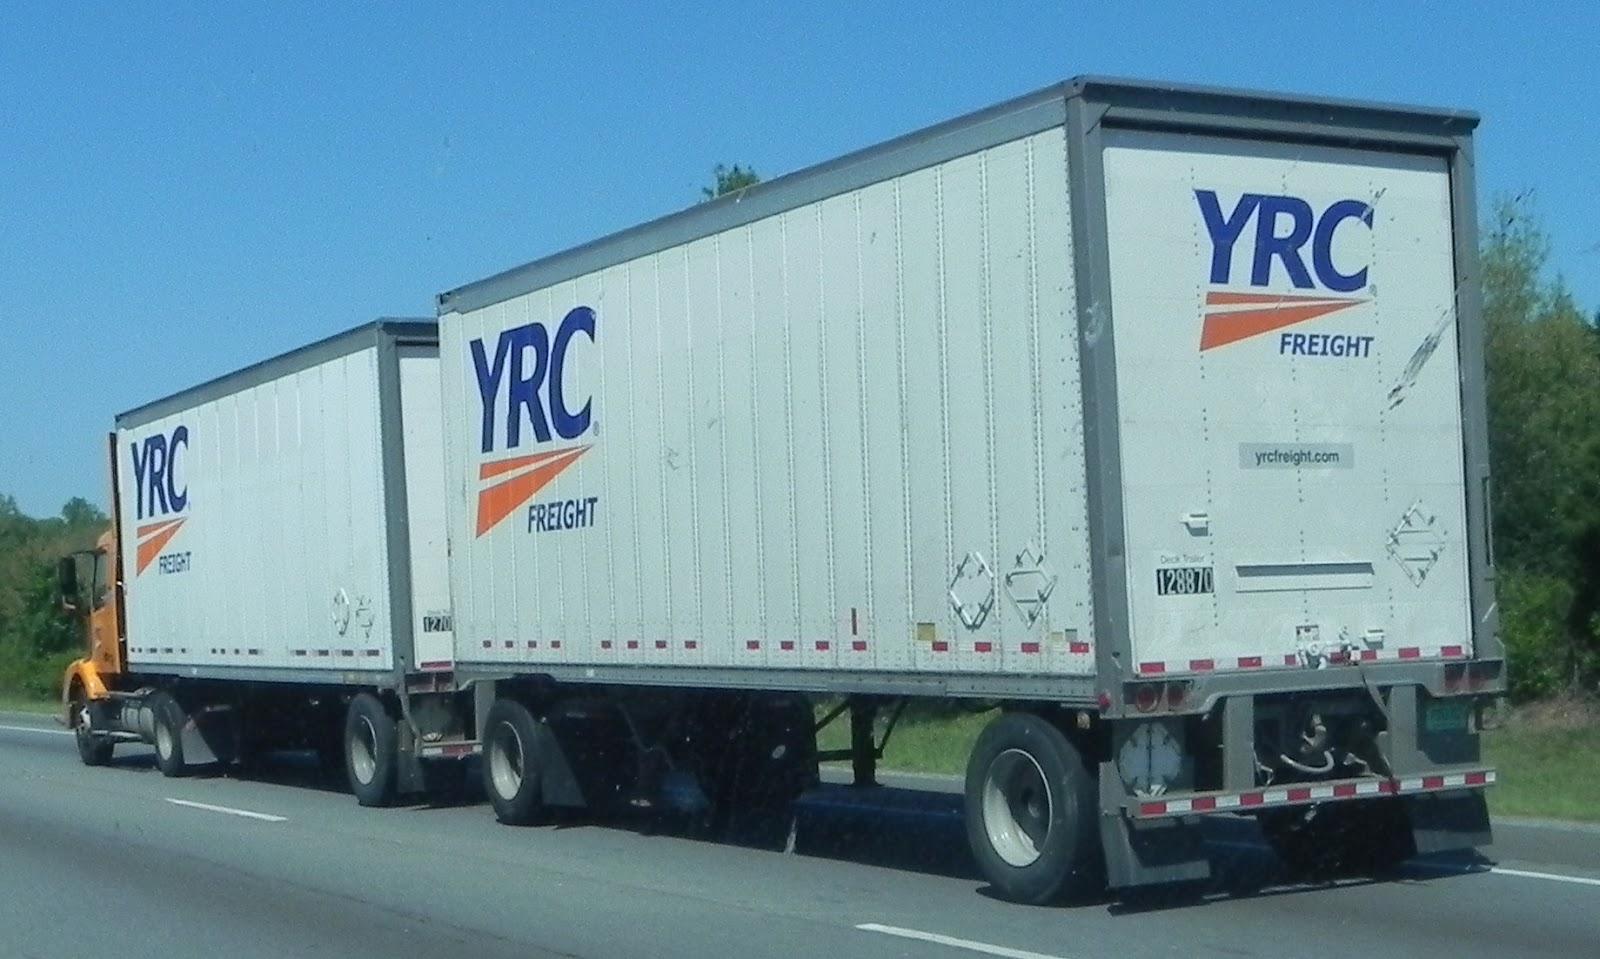 YRC Freight | Trucks On American Interstates